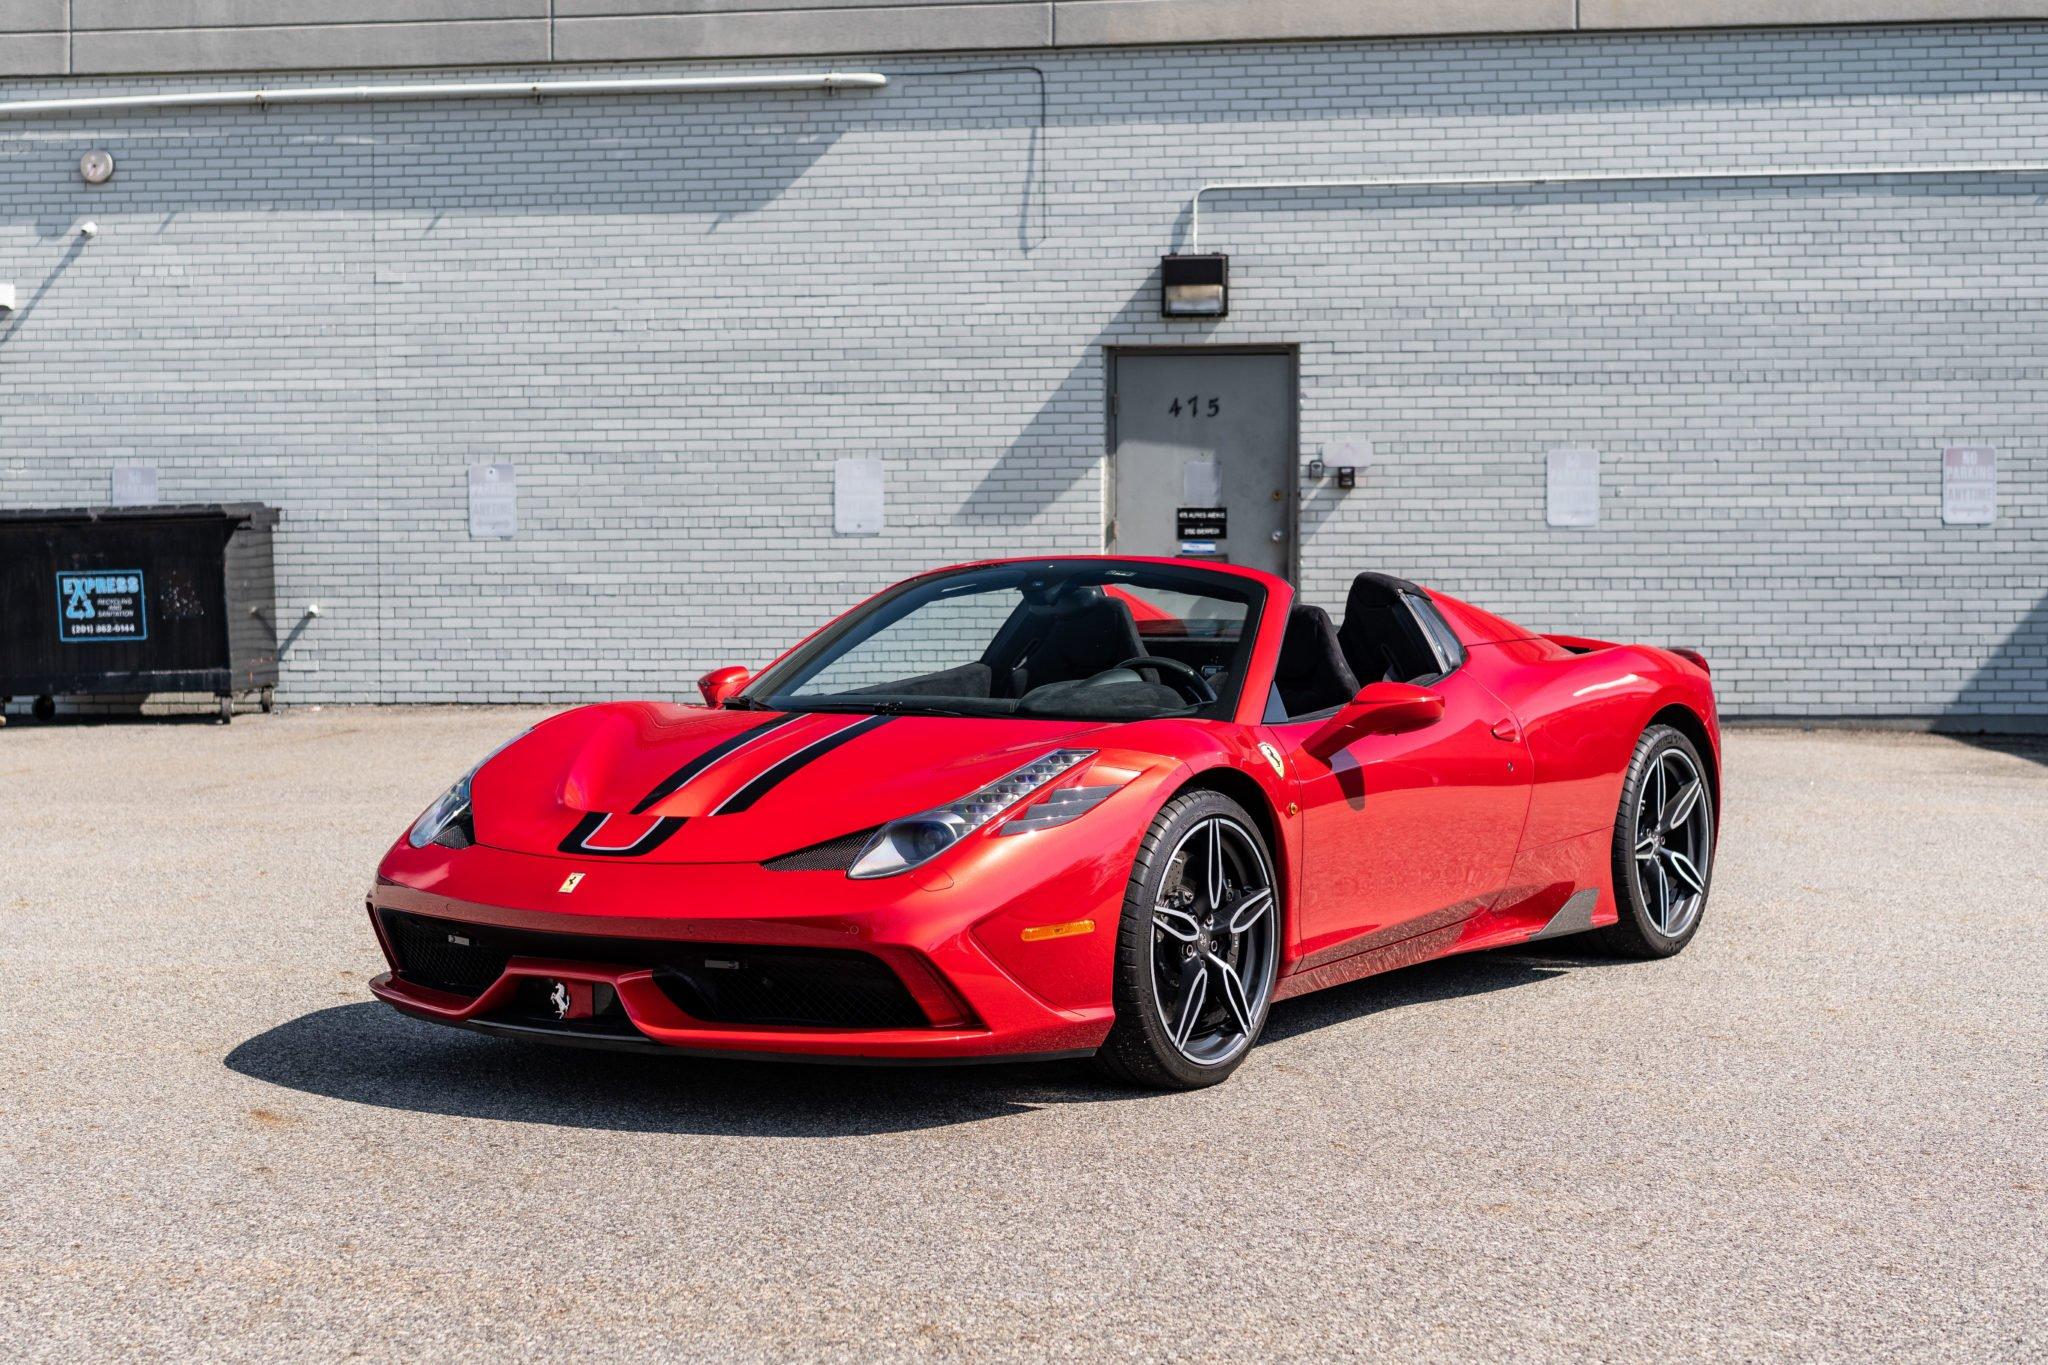 5 Best Lamborghinis Ever Made (5 Sick Ferraris We'd Rather Drive)